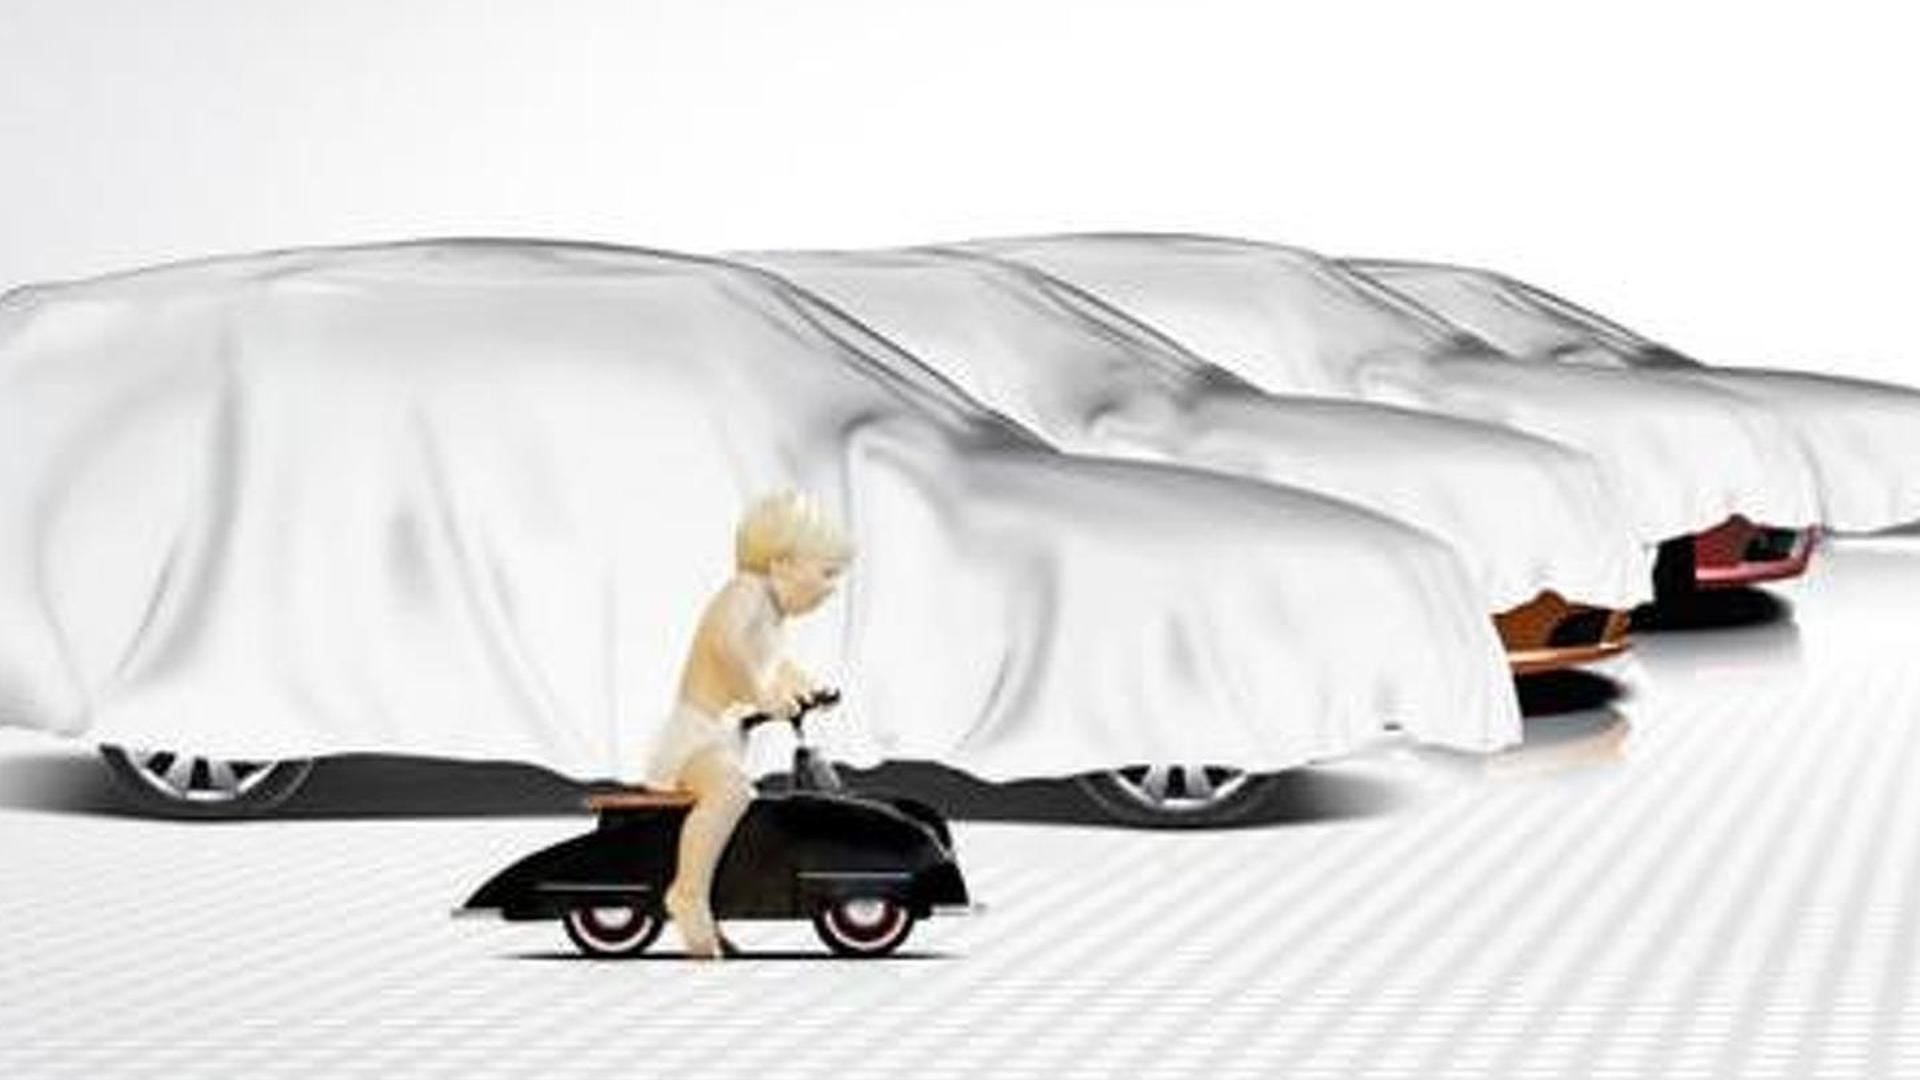 Saab concept teased for Geneva debut